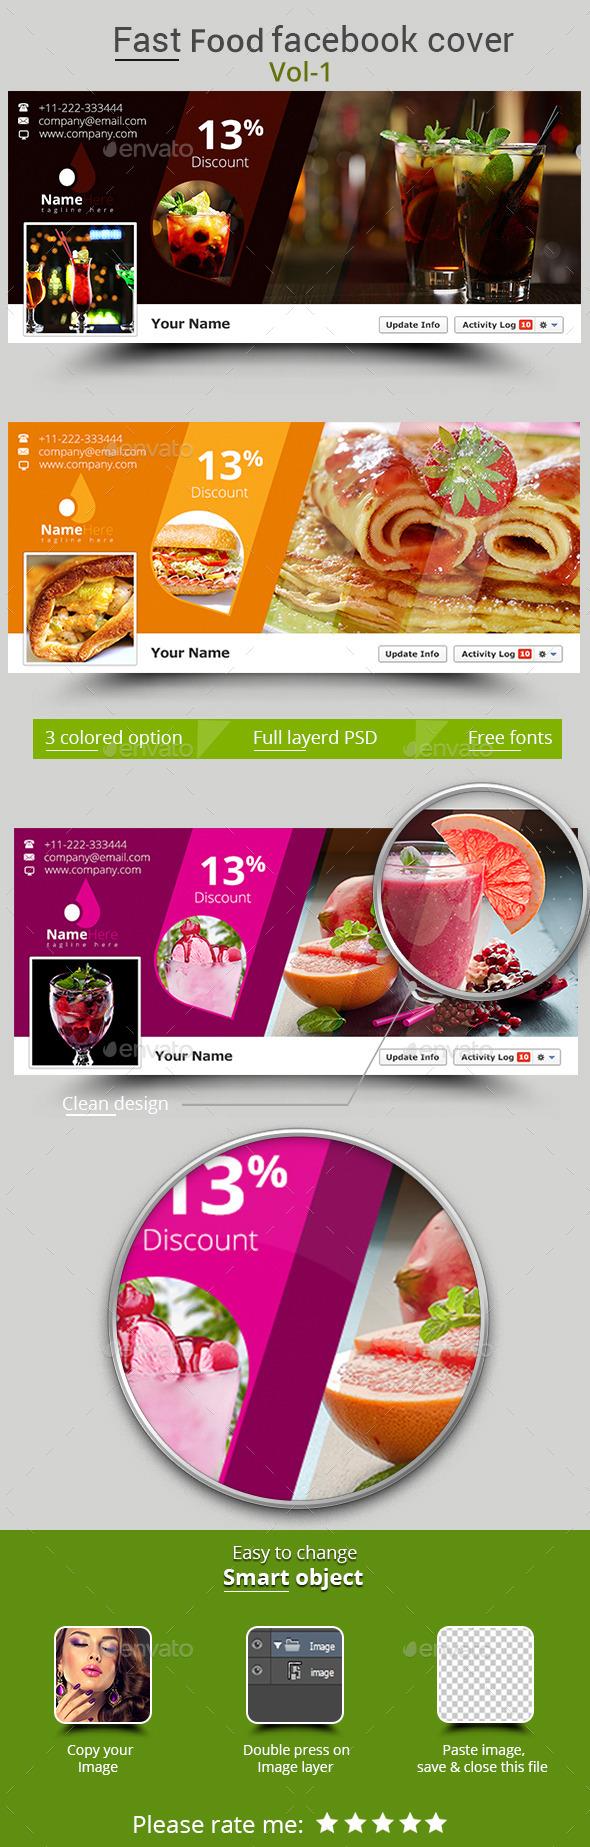 Fast Food Facebook Cover Vol-1 - Facebook Timeline Covers Social Media